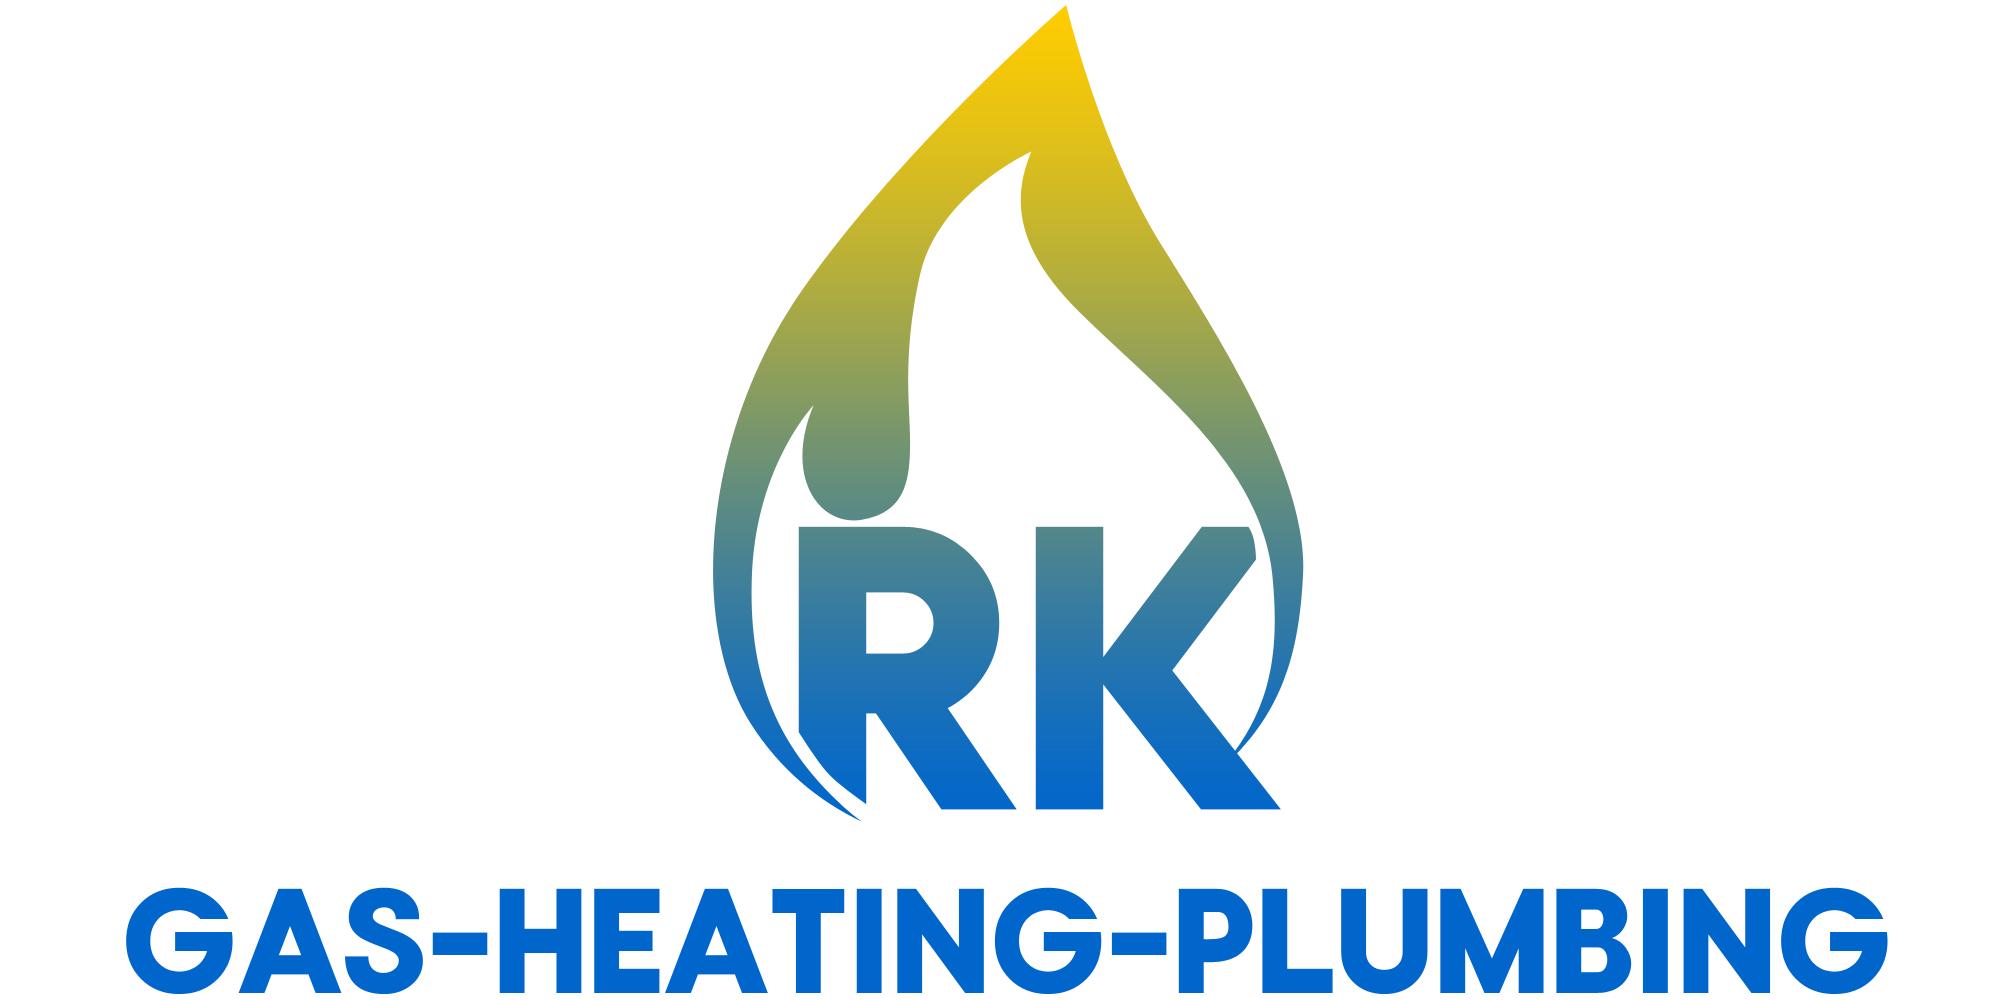 Rekan Kingji Verified Logo